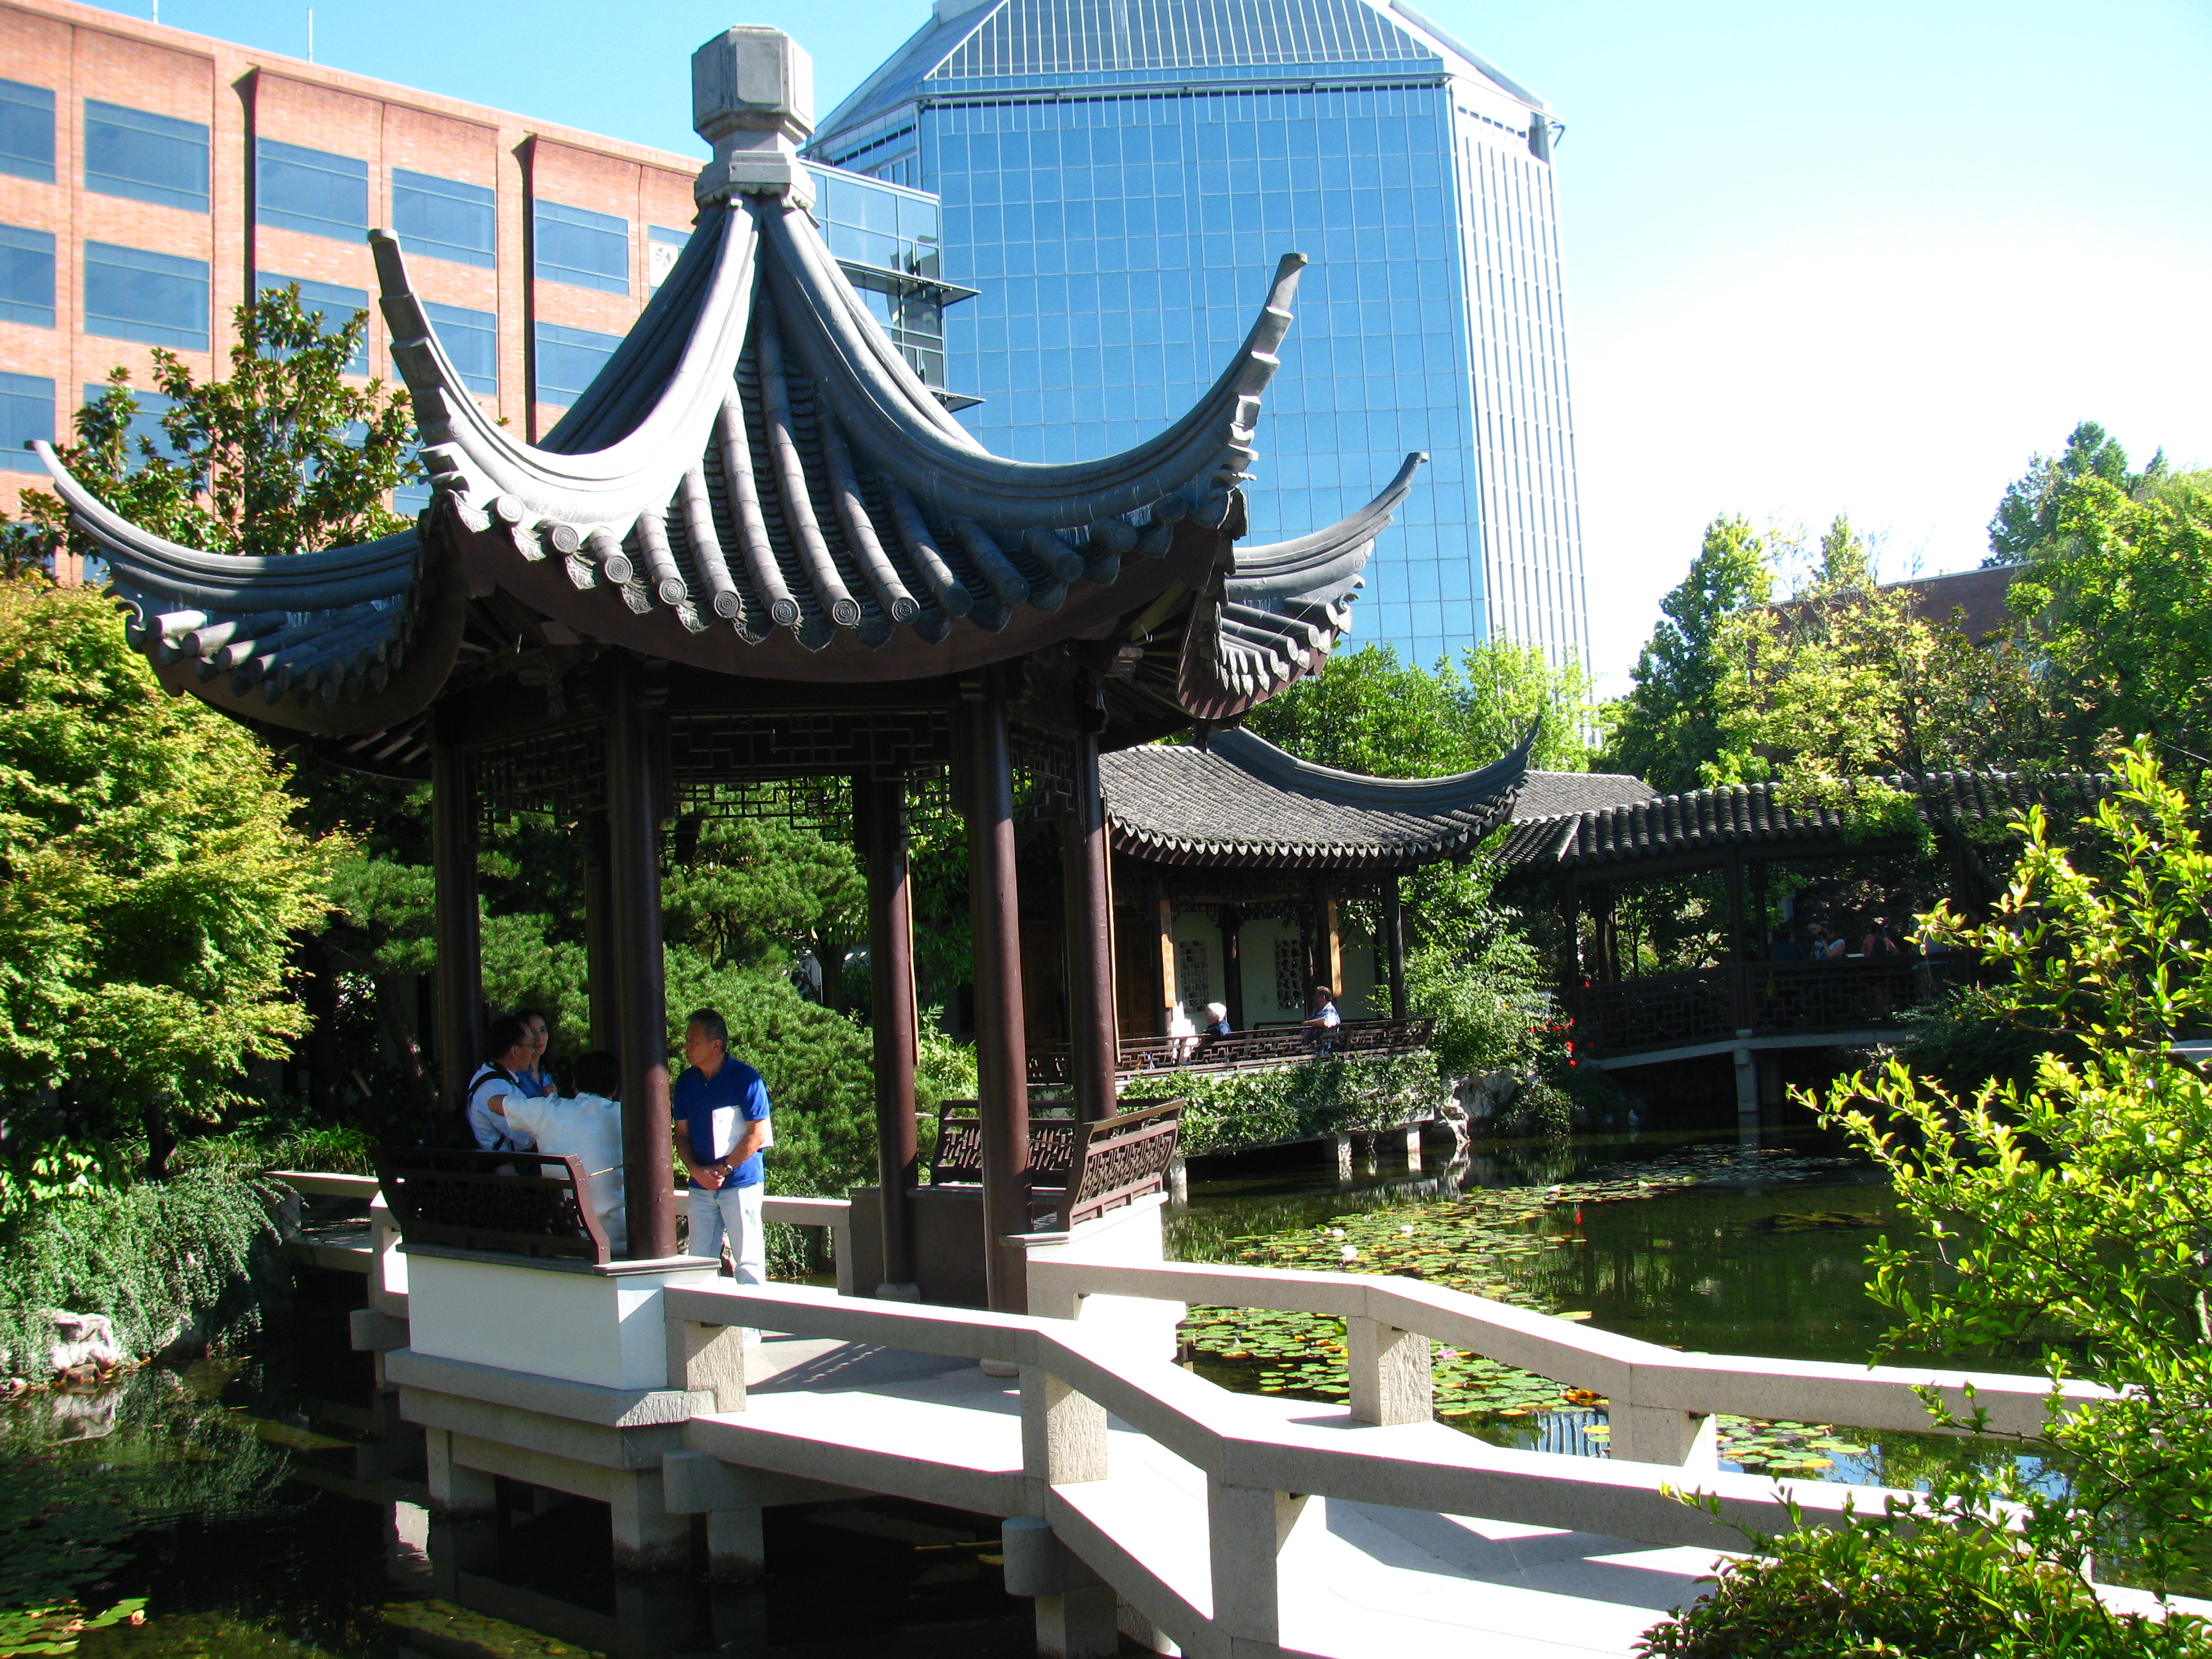 portland chinese garden - Chinese Garden Portland